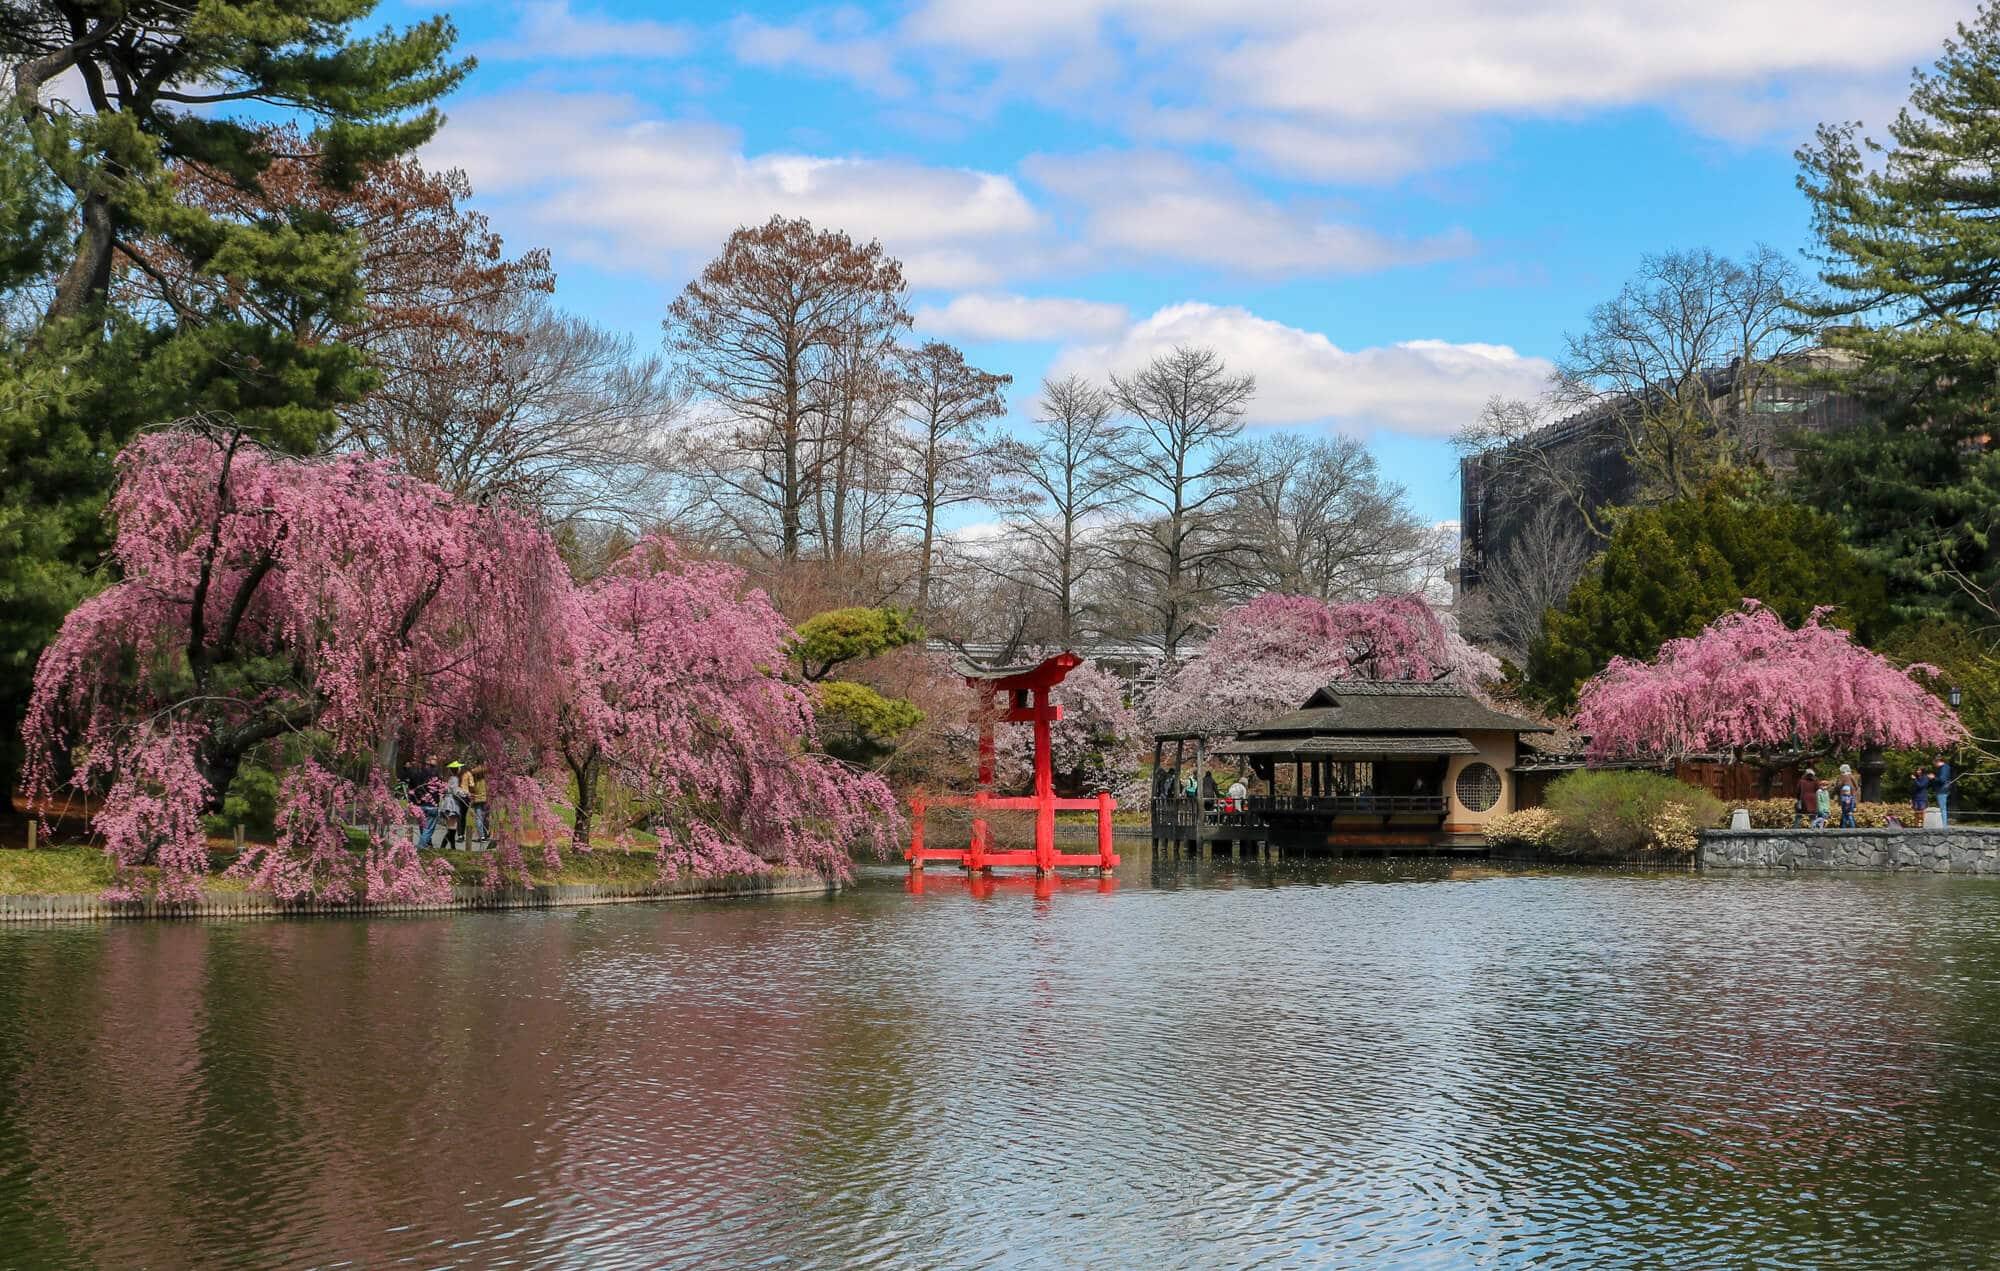 brooklyn botanic garden cherry blossoms 4 - Un voyage original entre amis : New York hors des sentiers battus